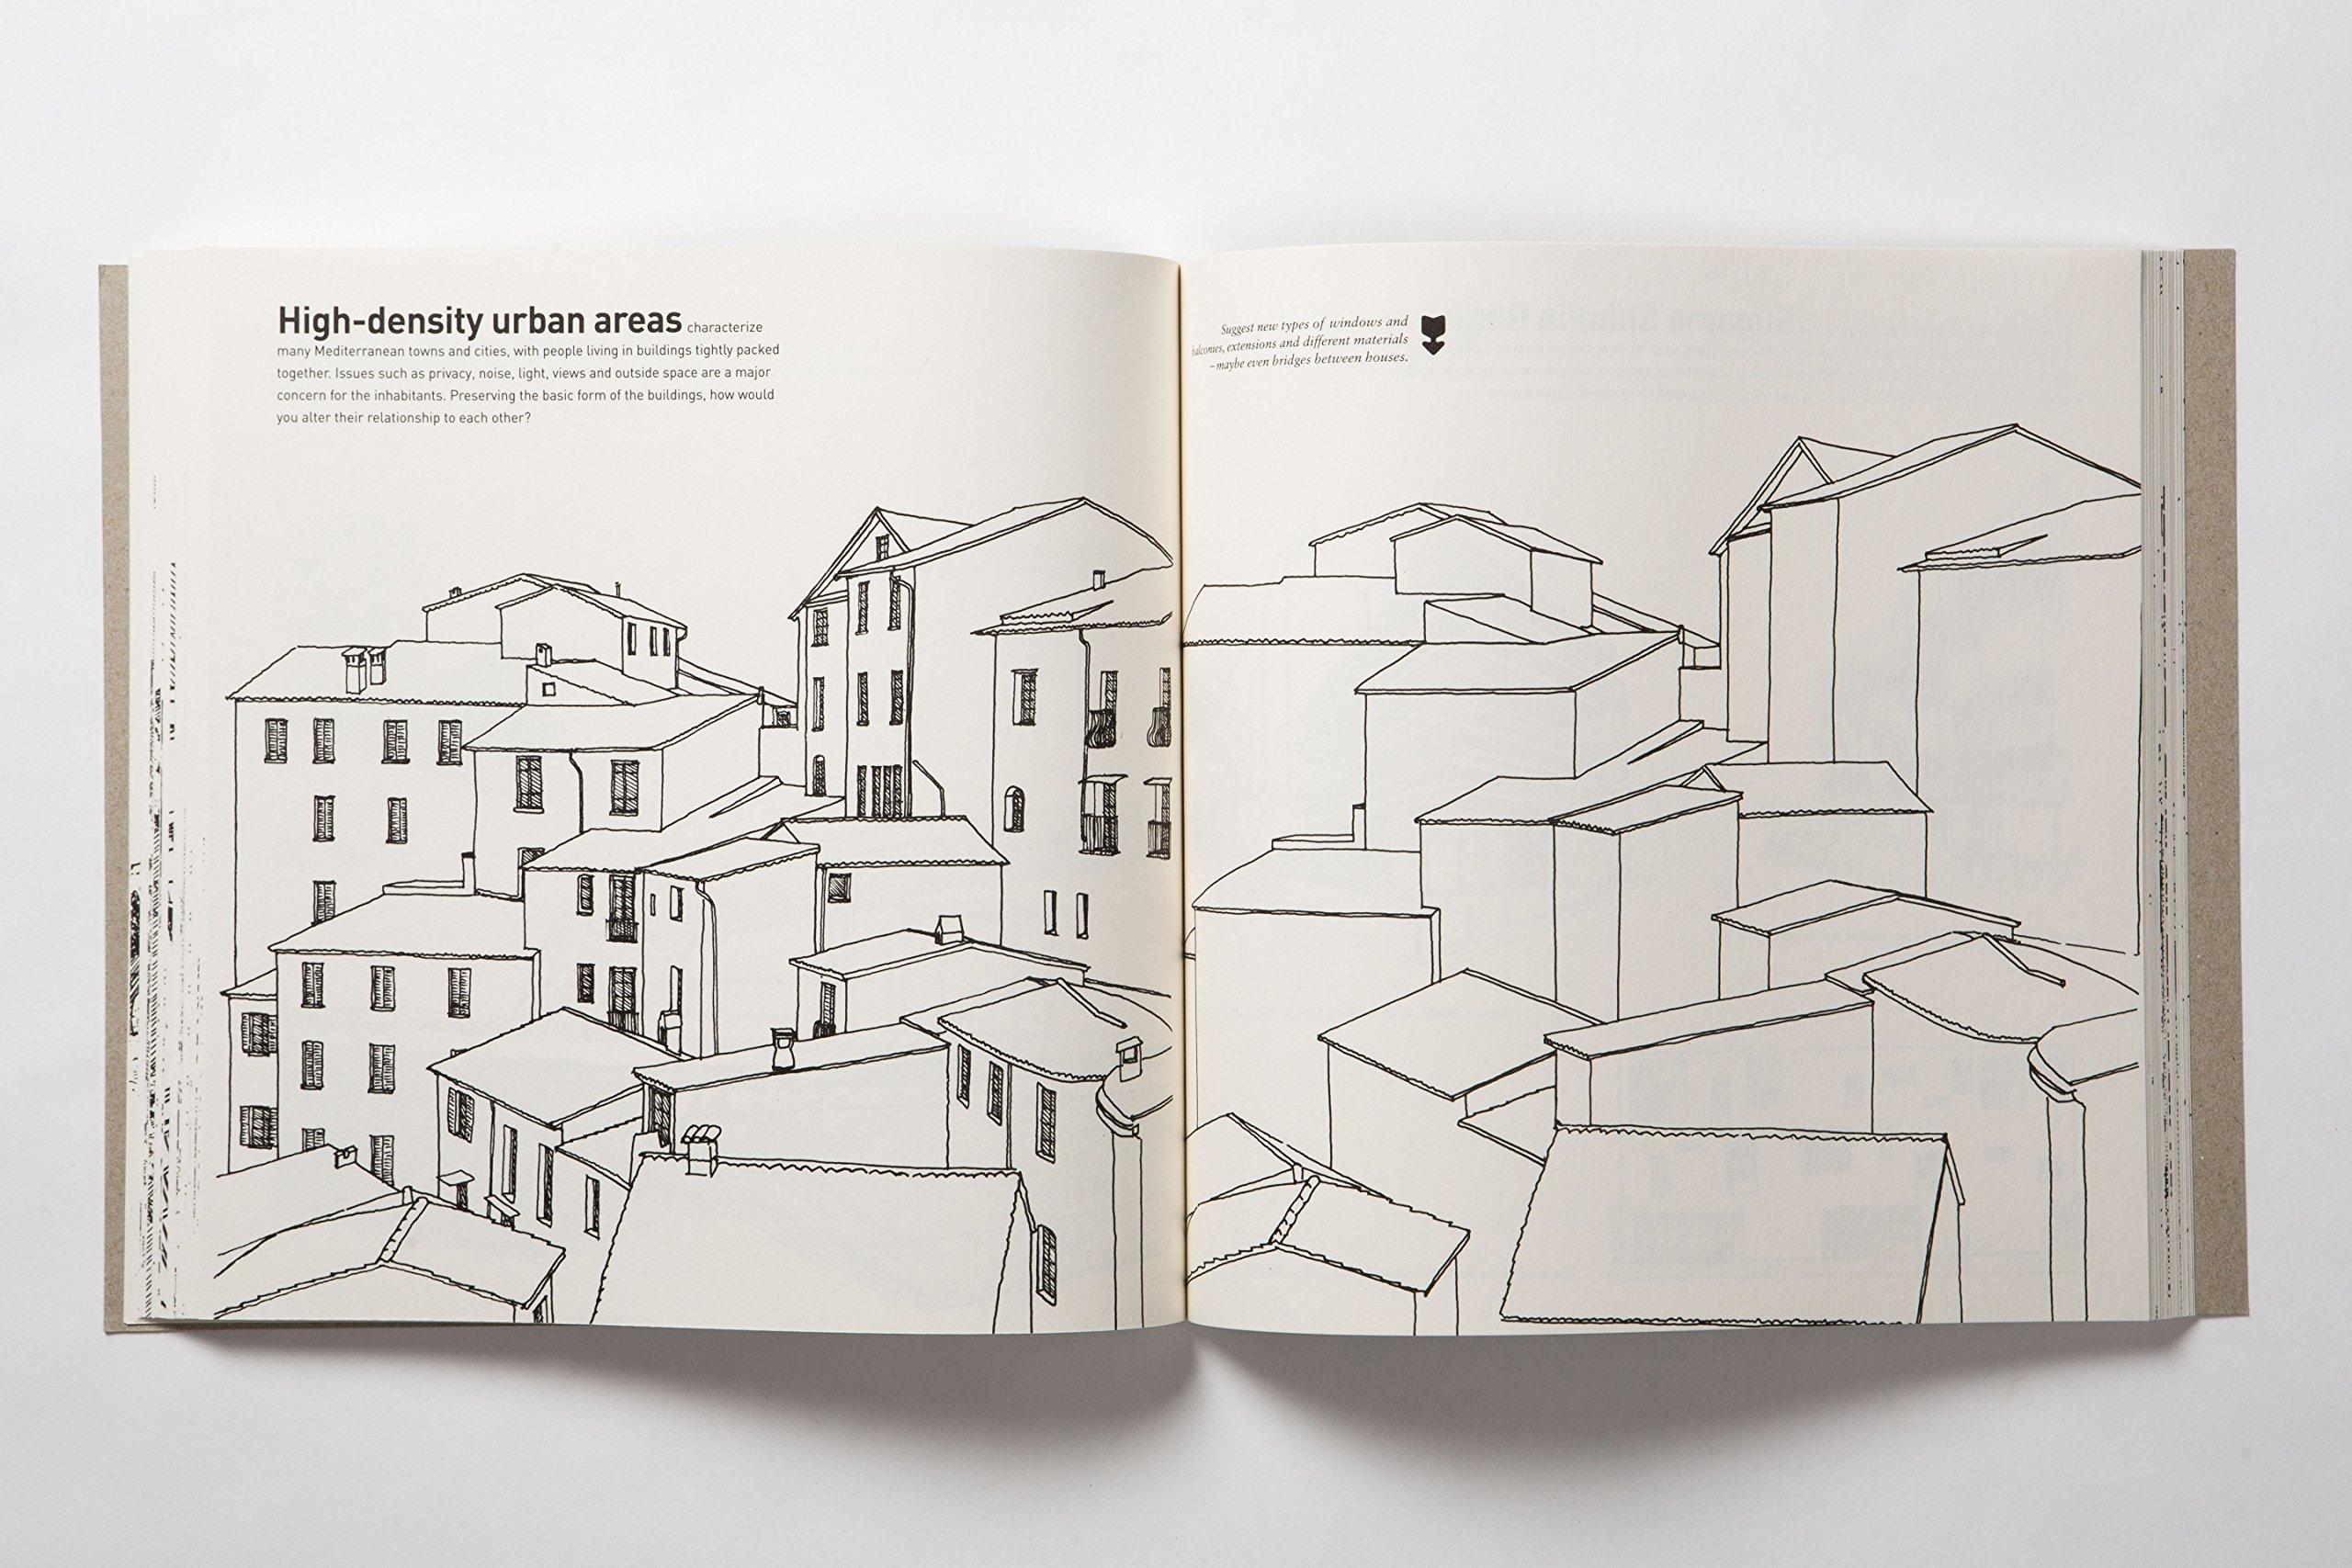 Archidoodle City: An Architect's Activity Book: Steve